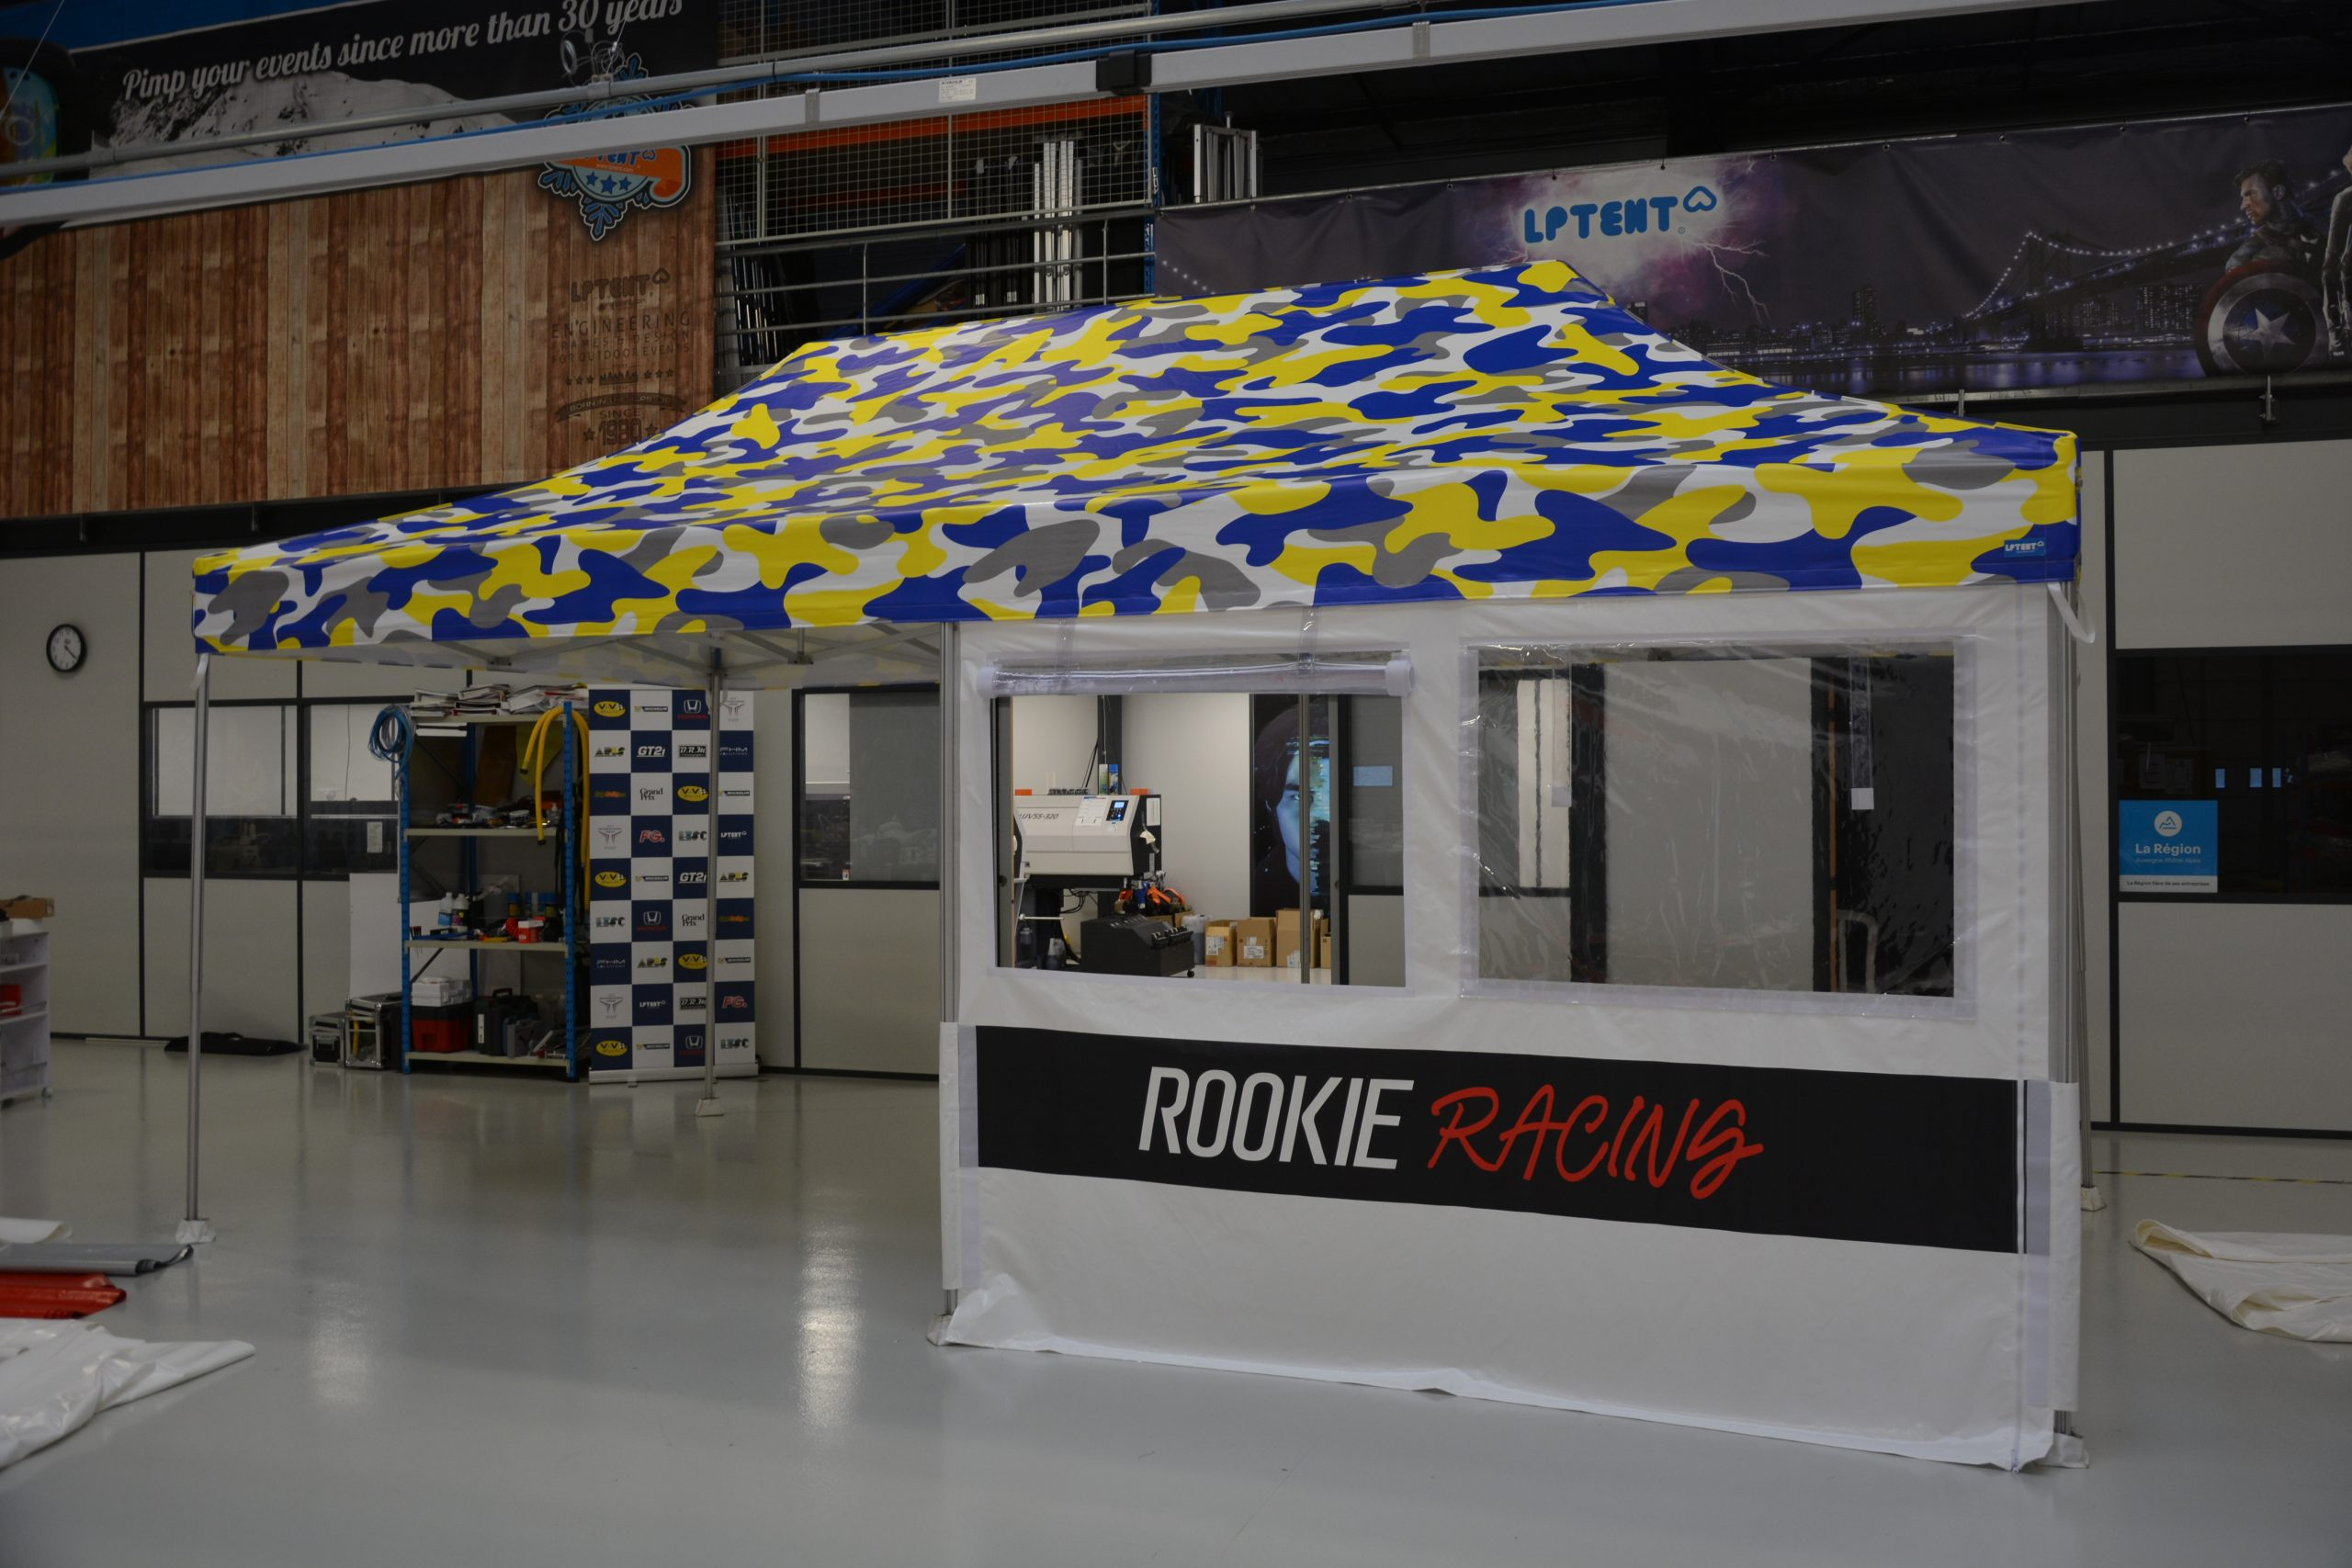 Barnum pliant Rooxie Racing 3x6